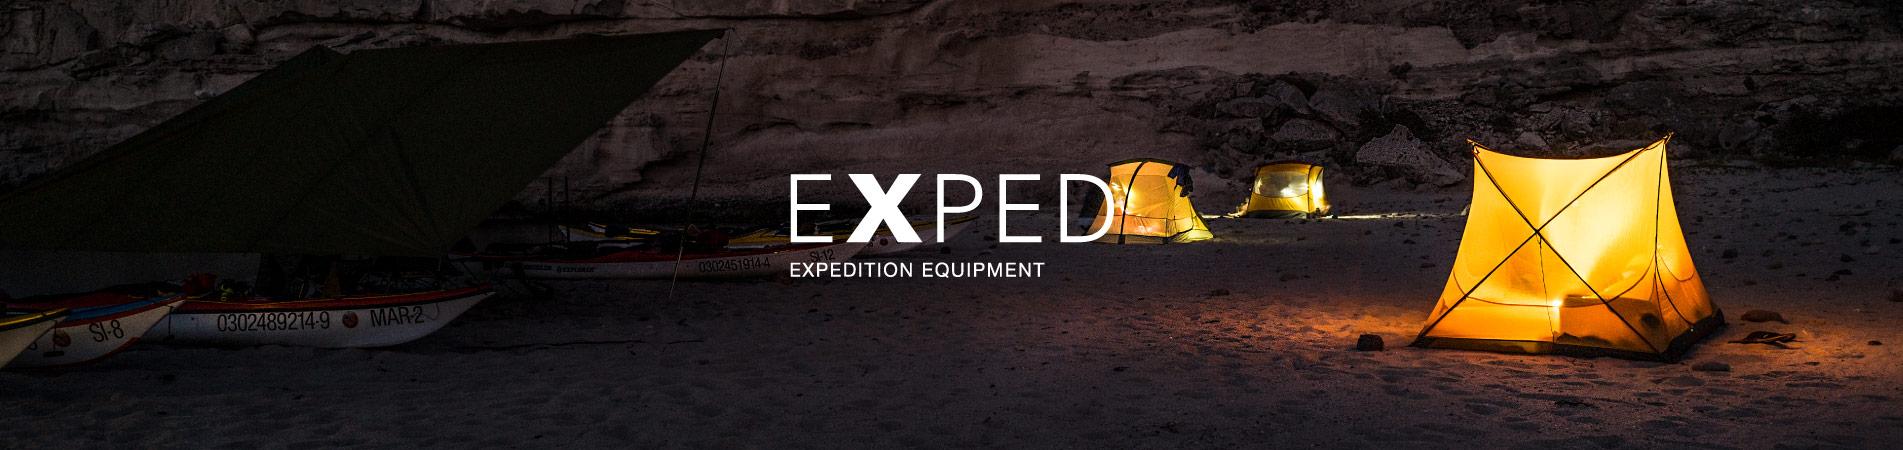 exped-v1r0.jpg